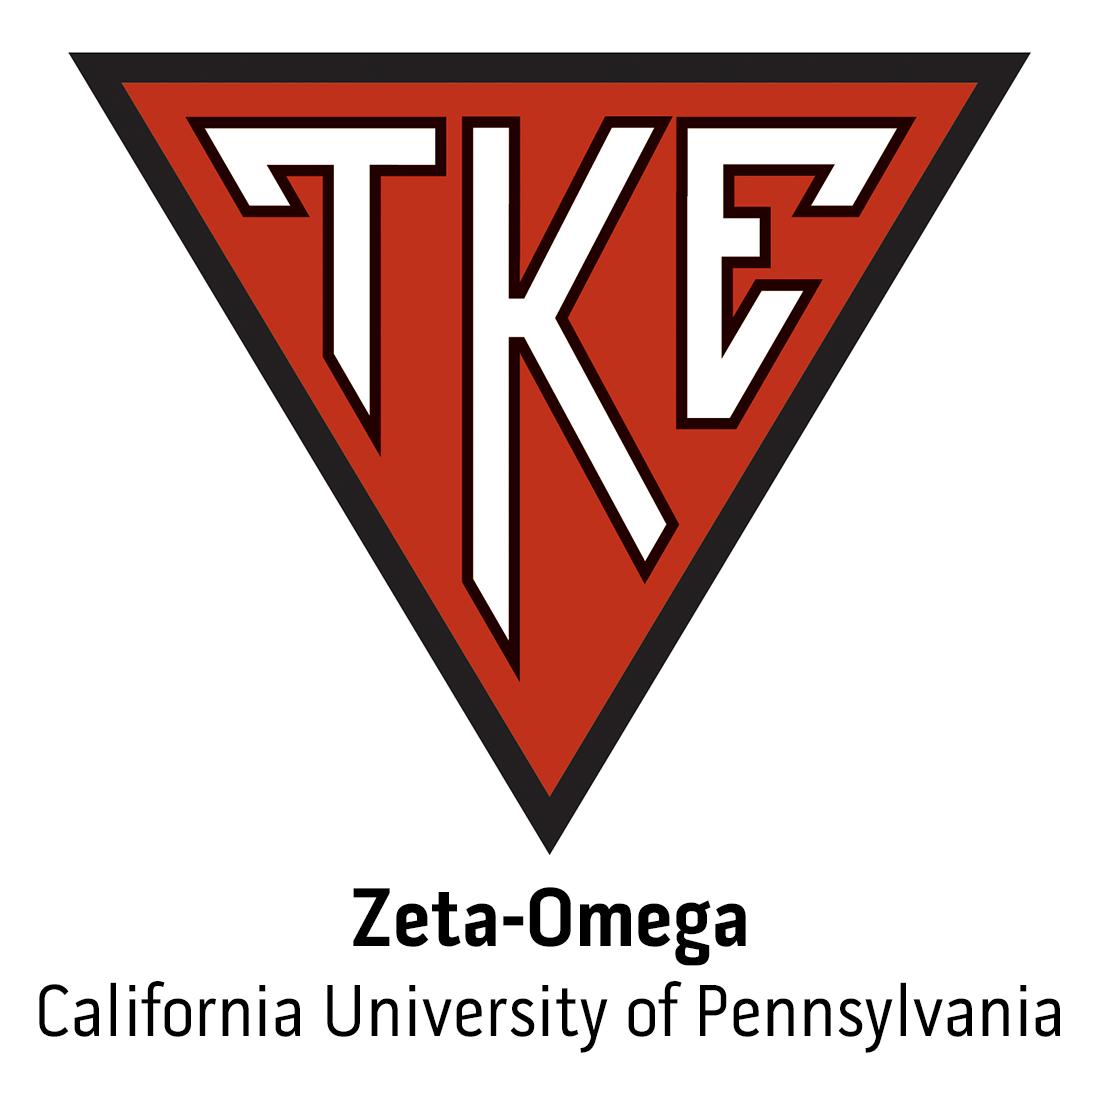 Zeta-Omega Chapter at California University of Pennsylvania